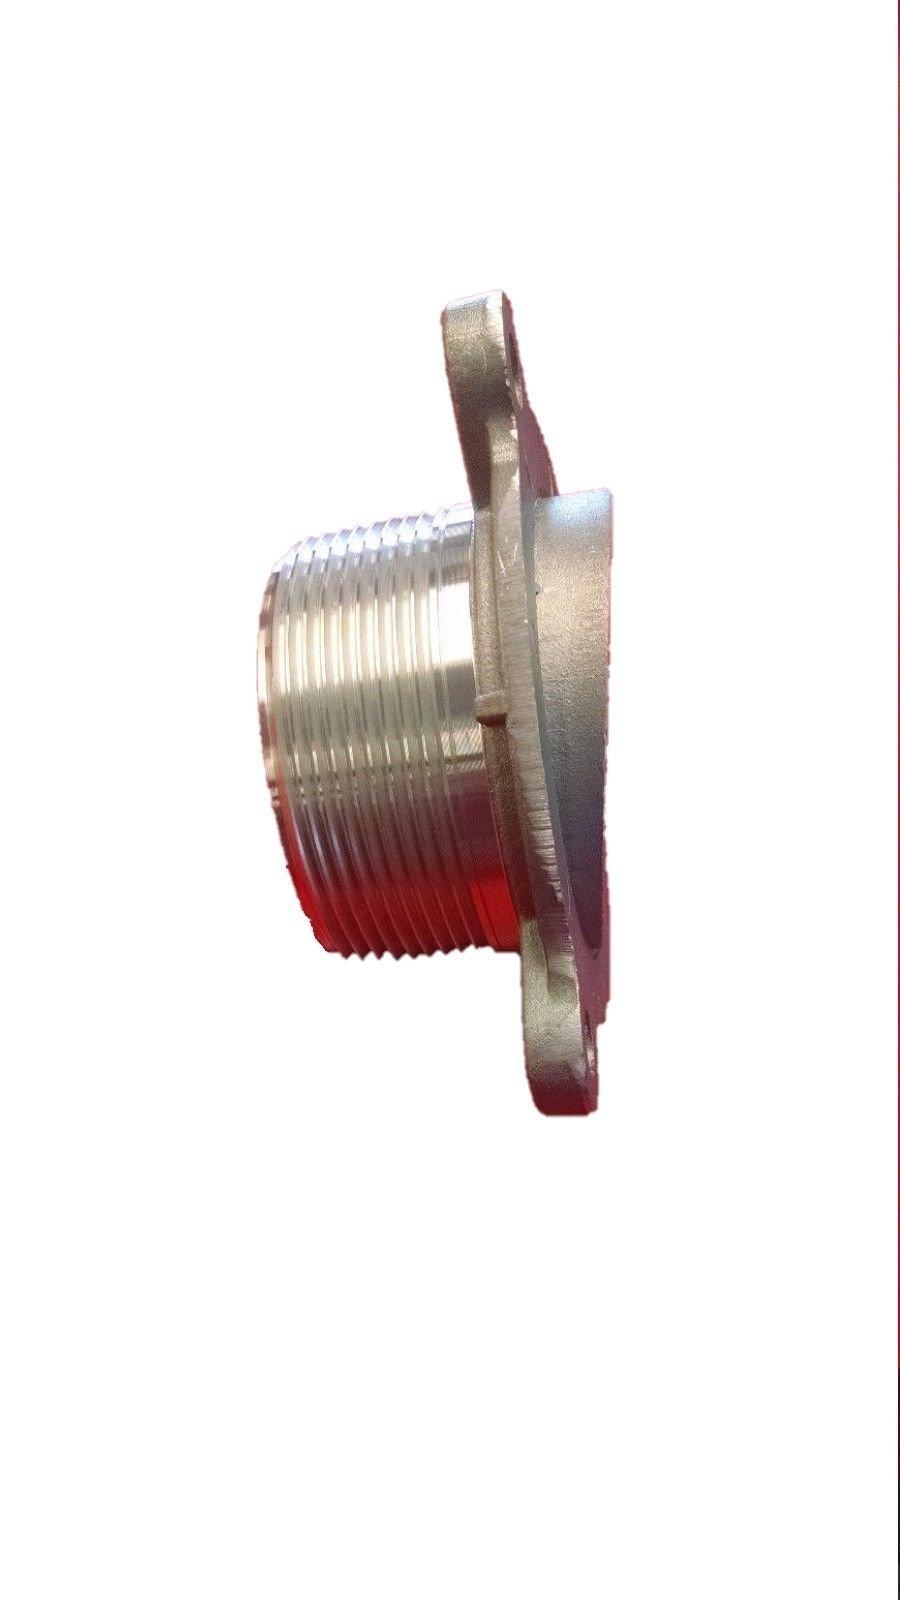 HYPRO DS-801-013N INLET PORT